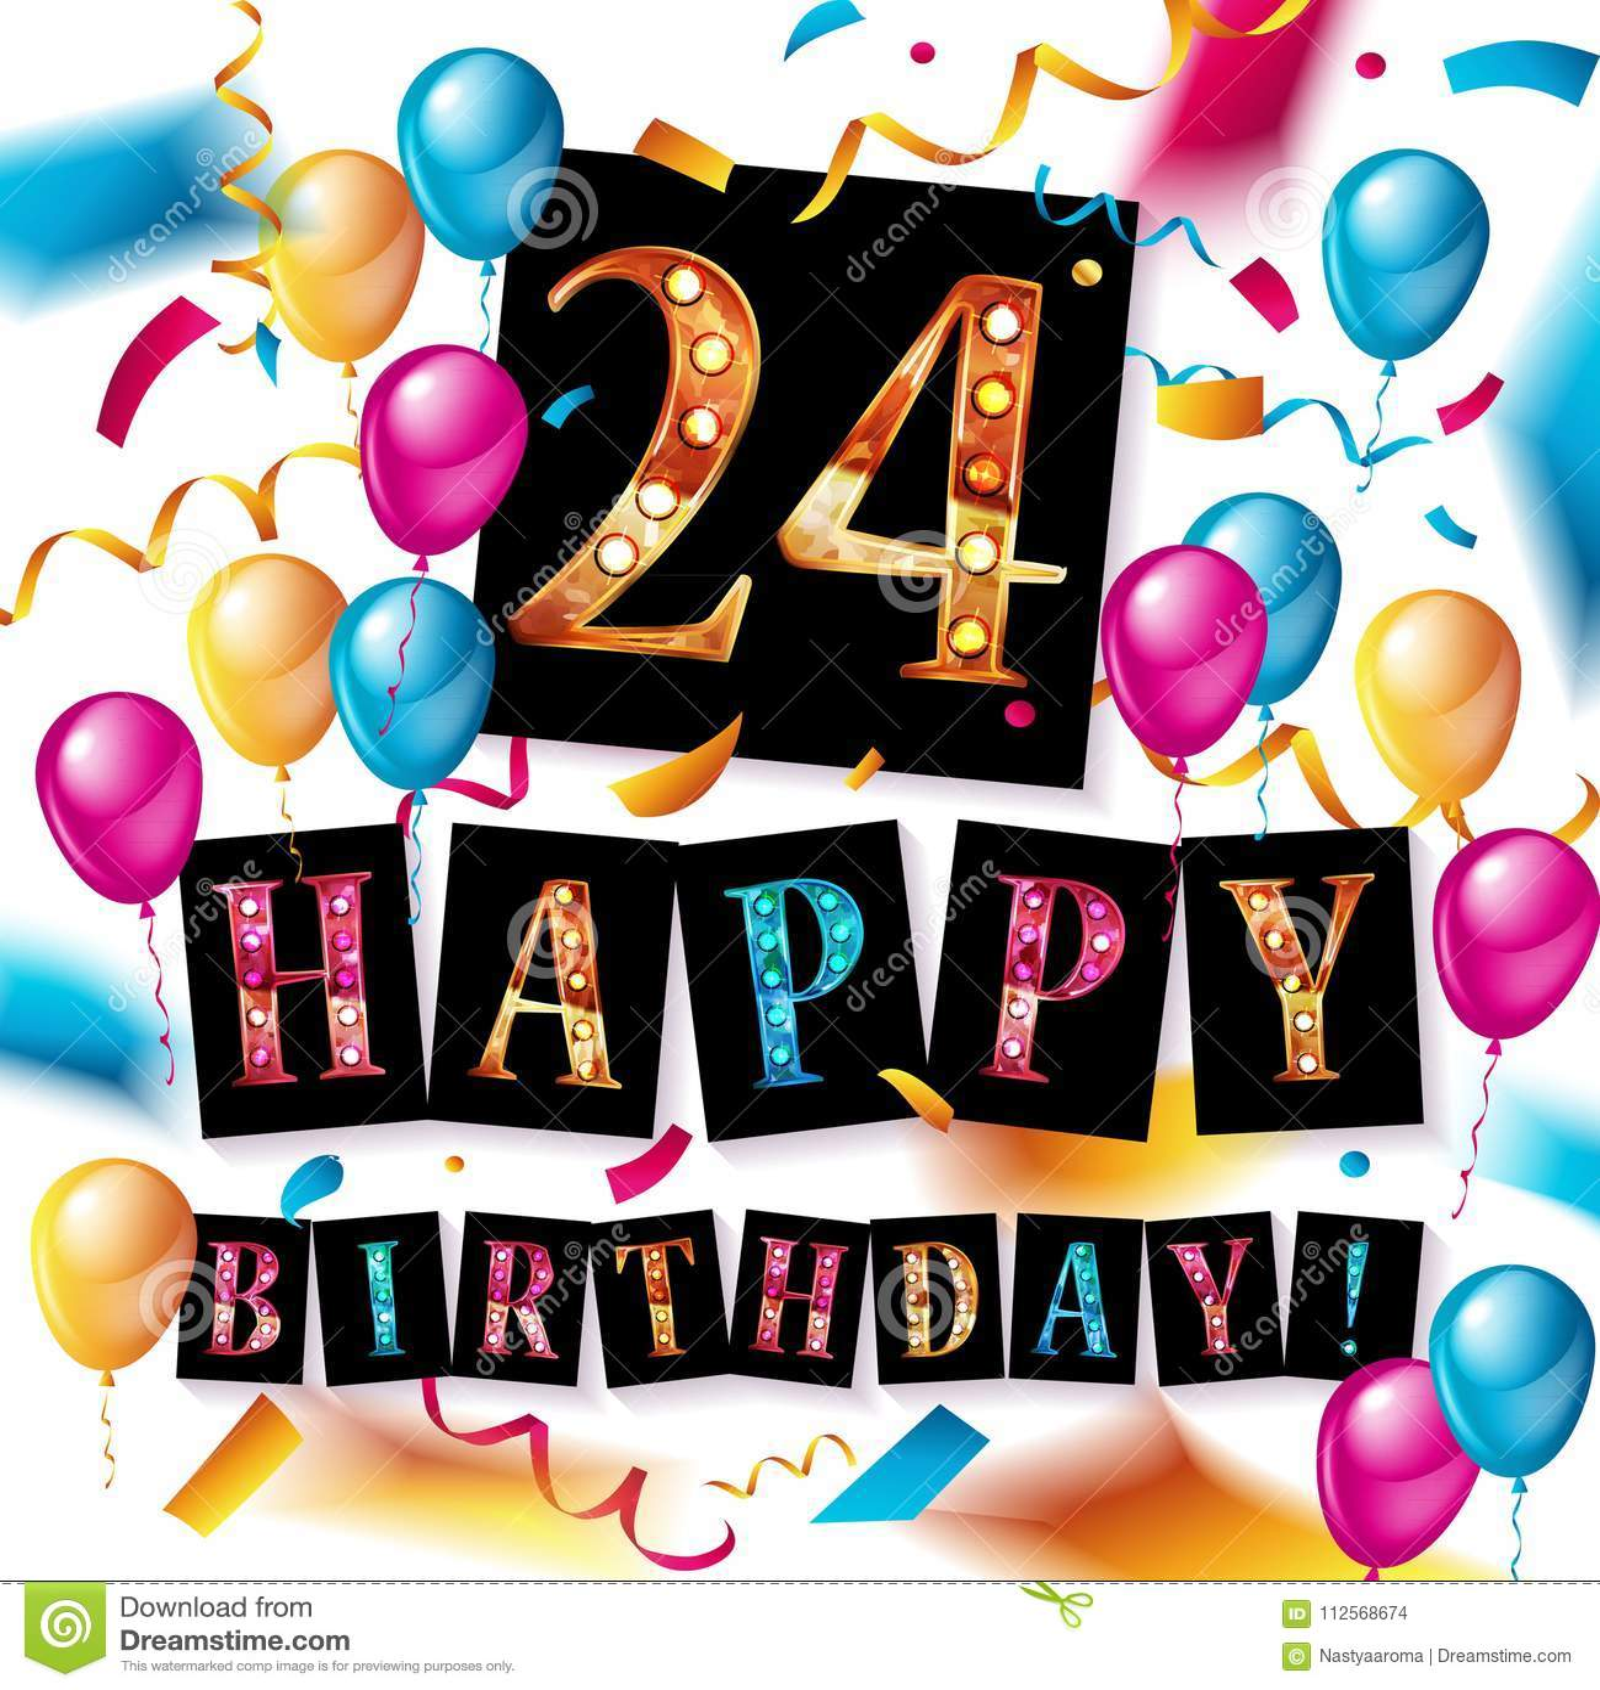 24th Anniversary Celebration Logotype